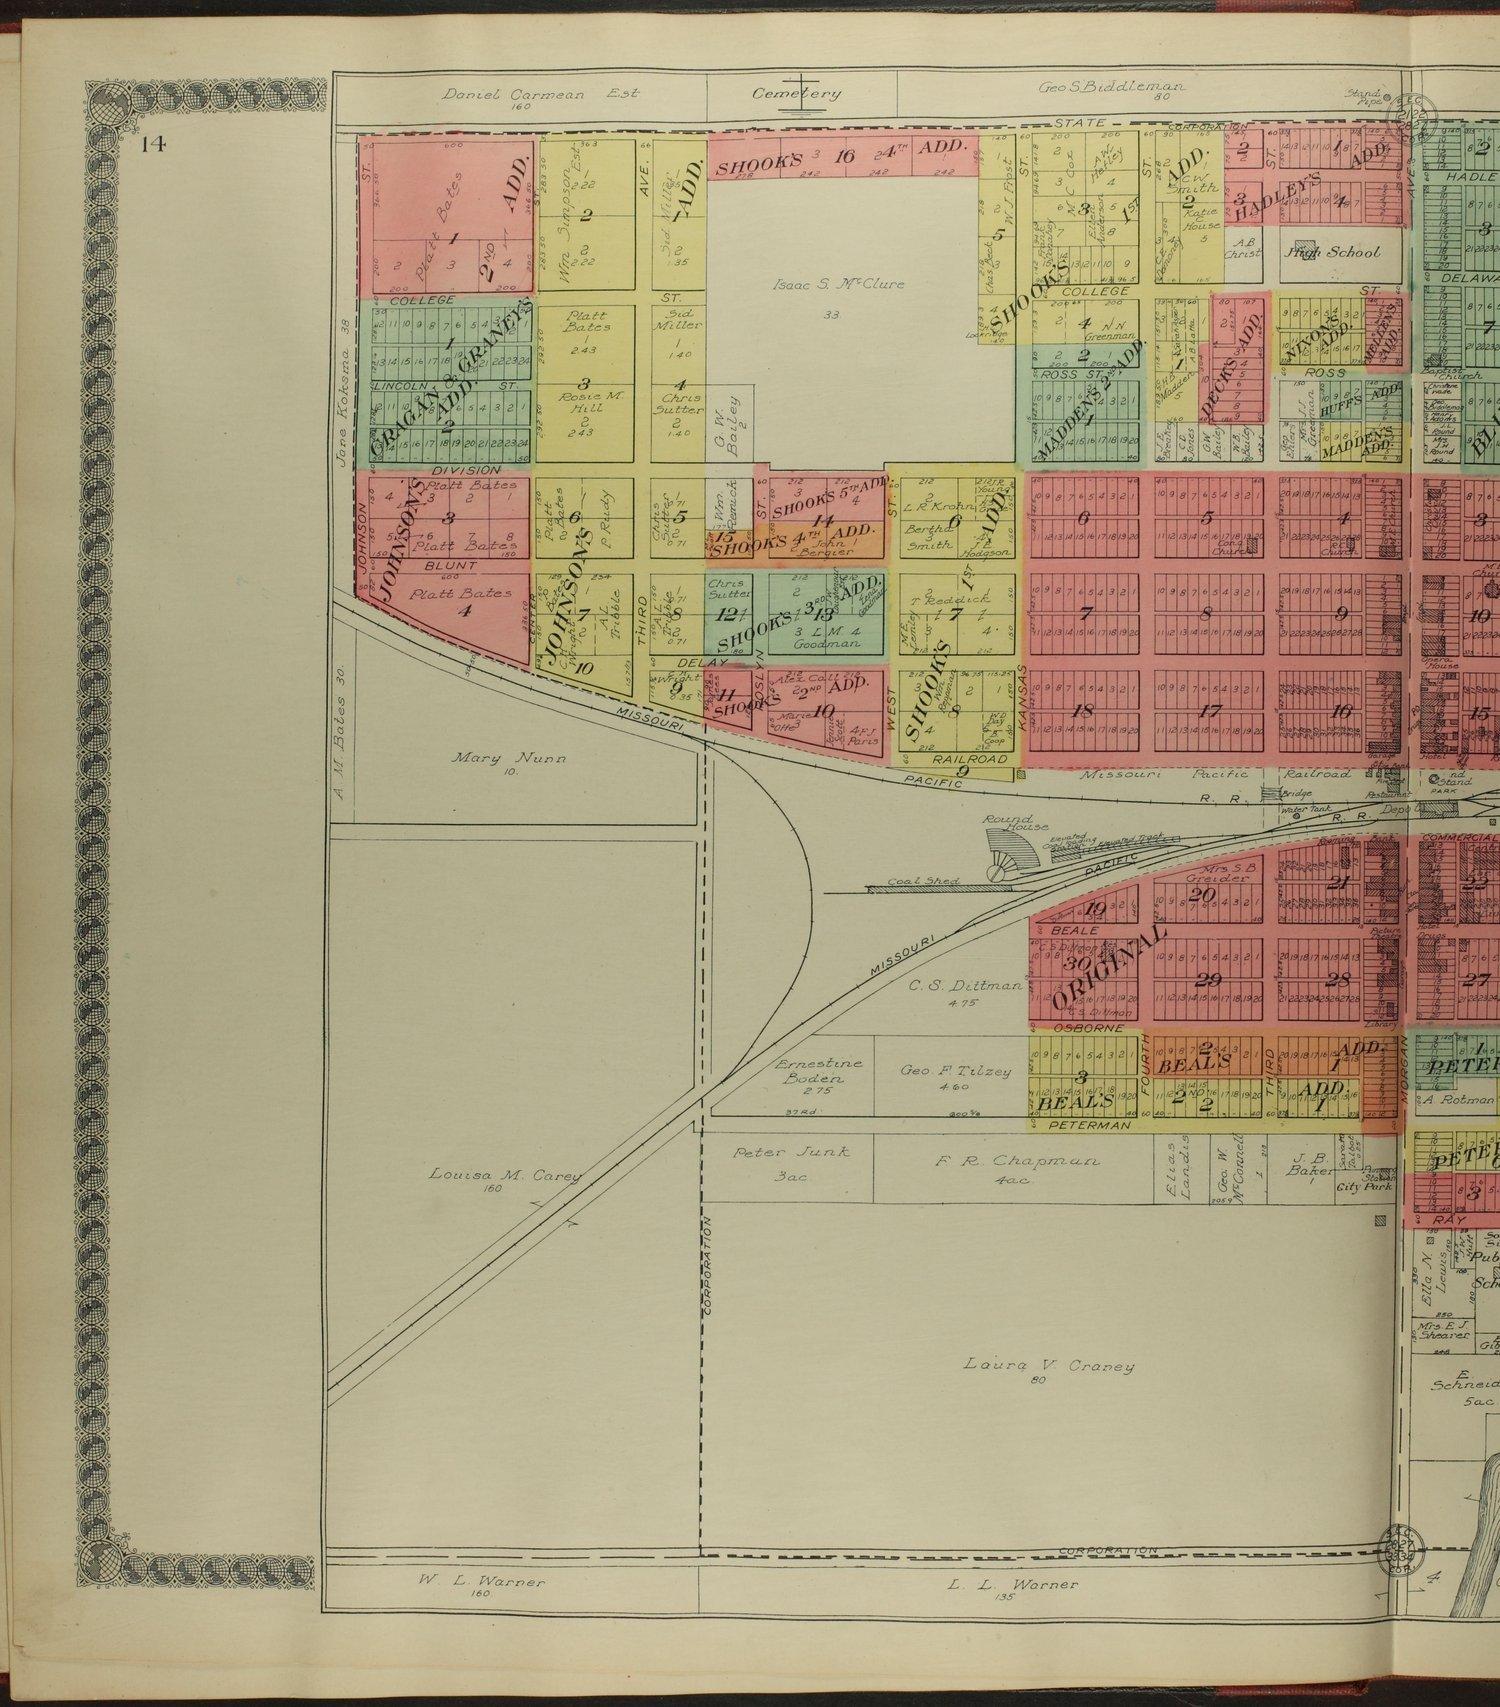 Standard atlas of Osborne County, Kansas - 14